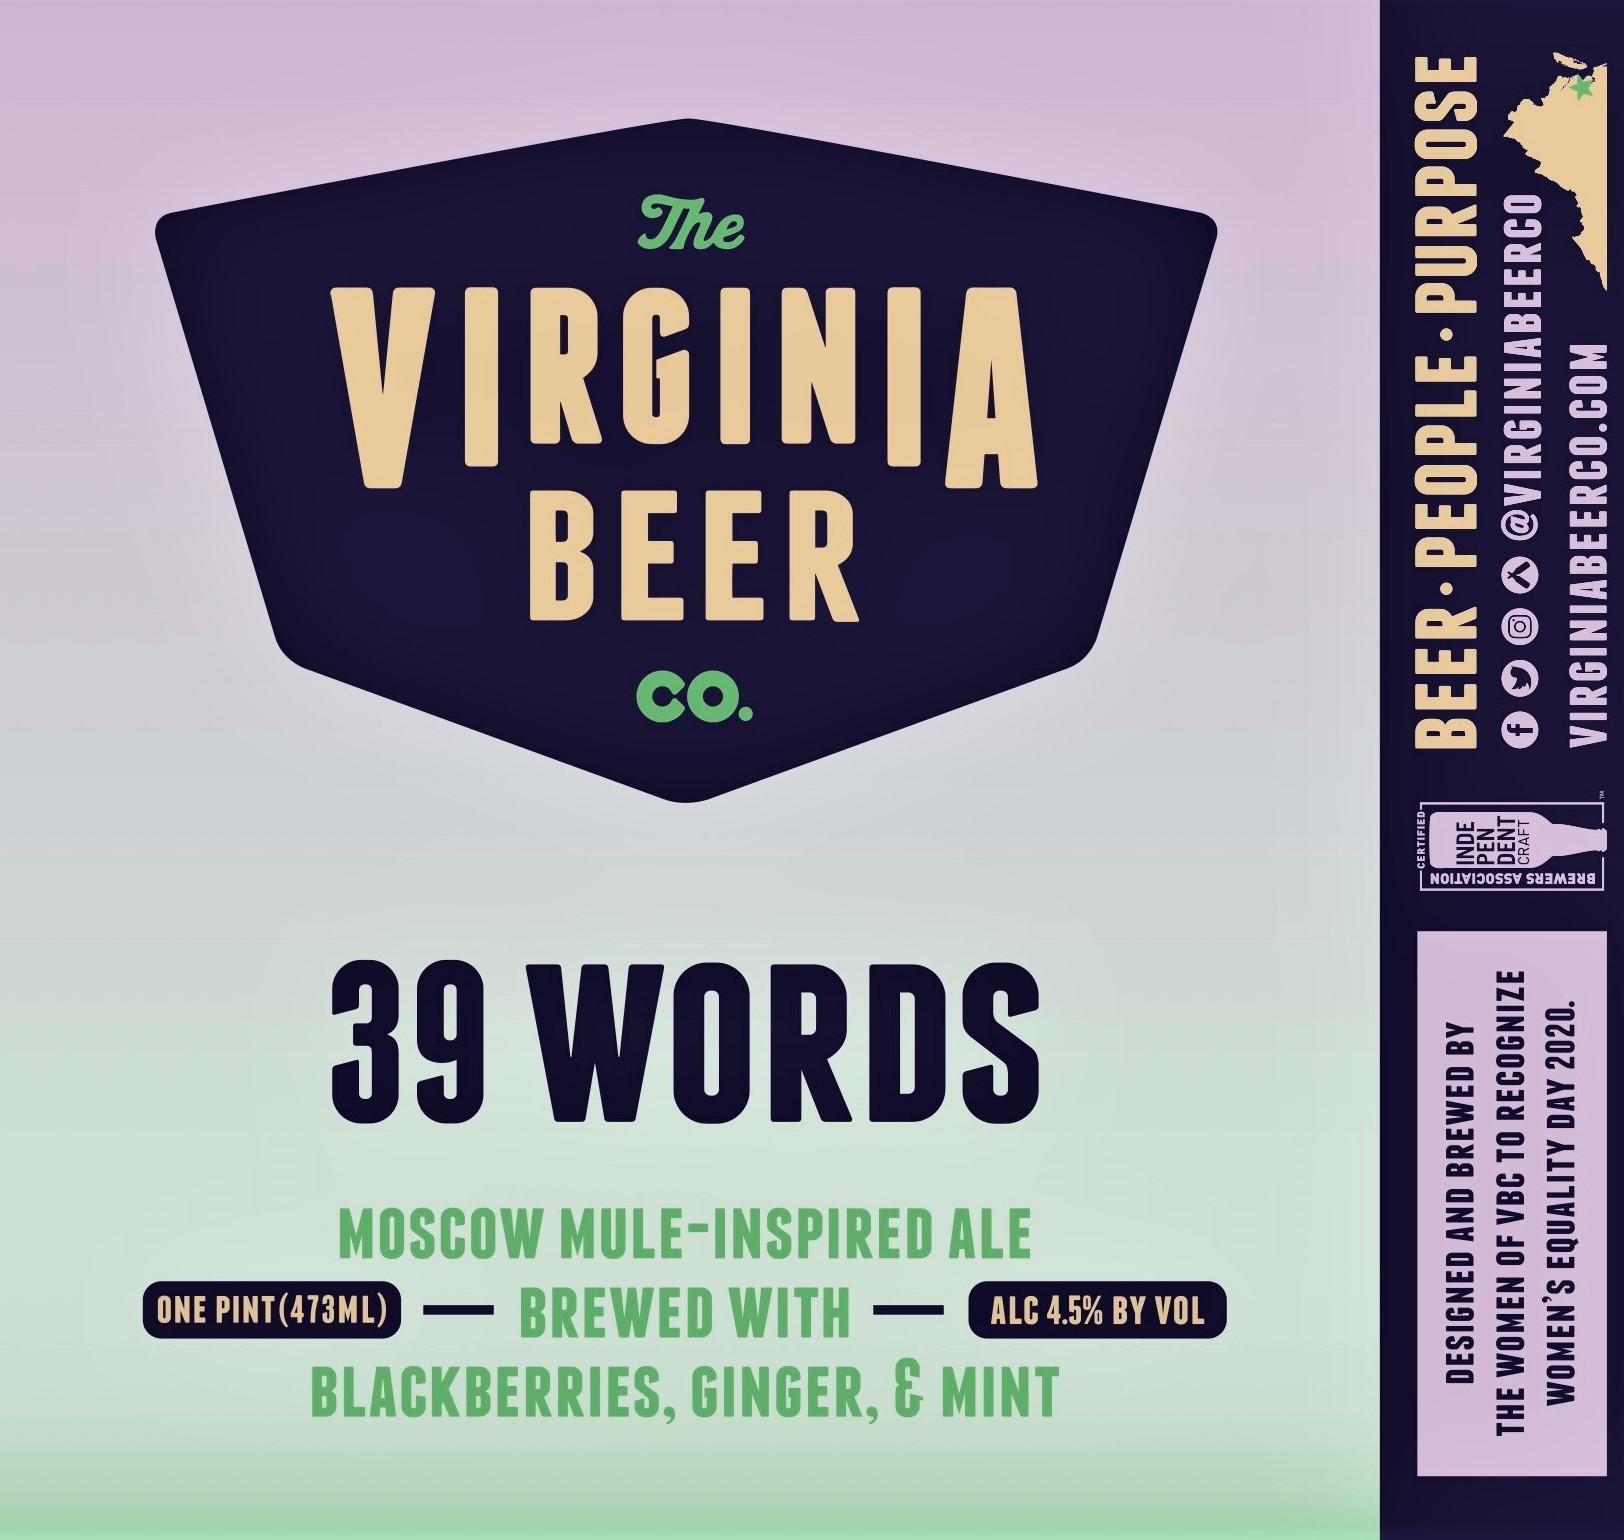 Virginia Beer Co. 39 Words (2020) beer Label Full Size